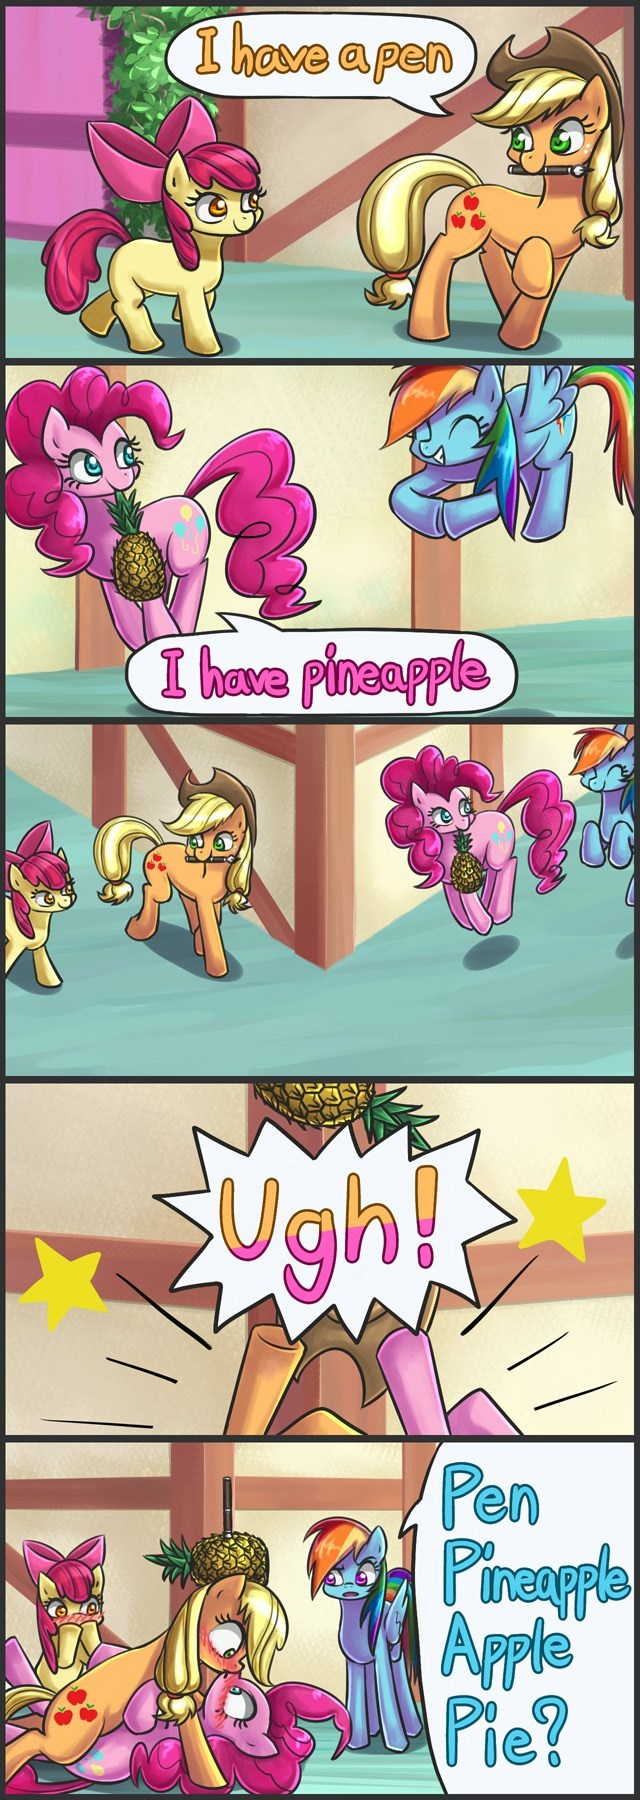 shipping applejack kitten tail apple bloom puns pinkie pie pen pineapple apple pen comic - 9075198720